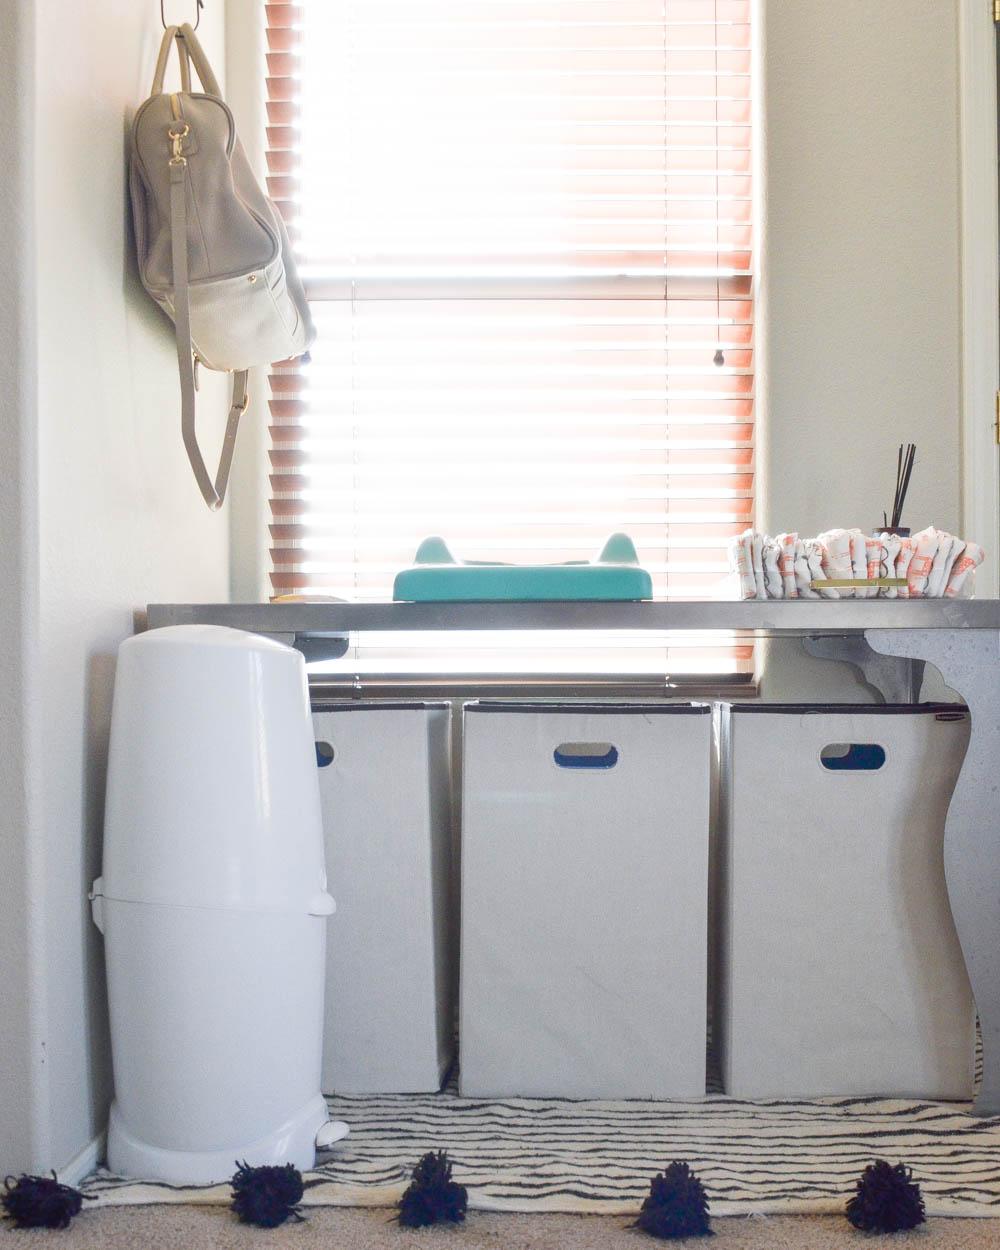 Master Bedroom | CoSleeping Bedroom | CoSleeping | Newborn | Laundry Organization | Diaper Changing Station